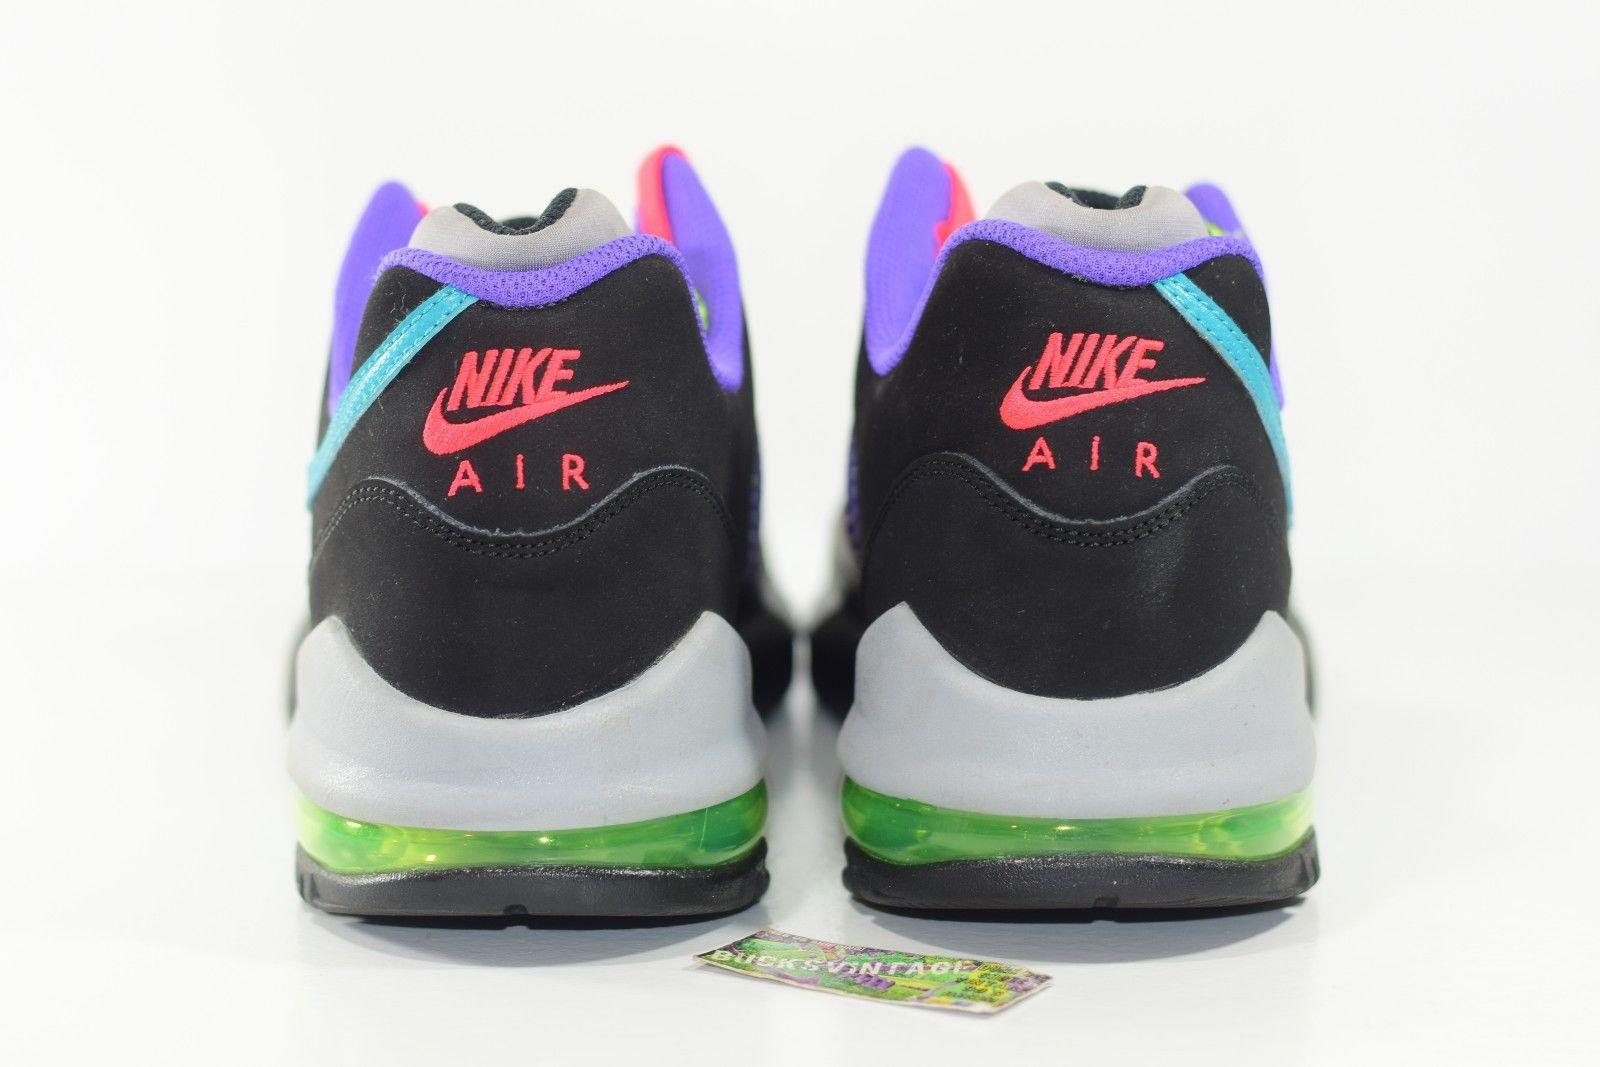 on sale 8a2b4 840b2 ... Size 9   2013 Nike Air Max 360 Trainer Bo Jackson Unreleased Promo  Sample Neon ...